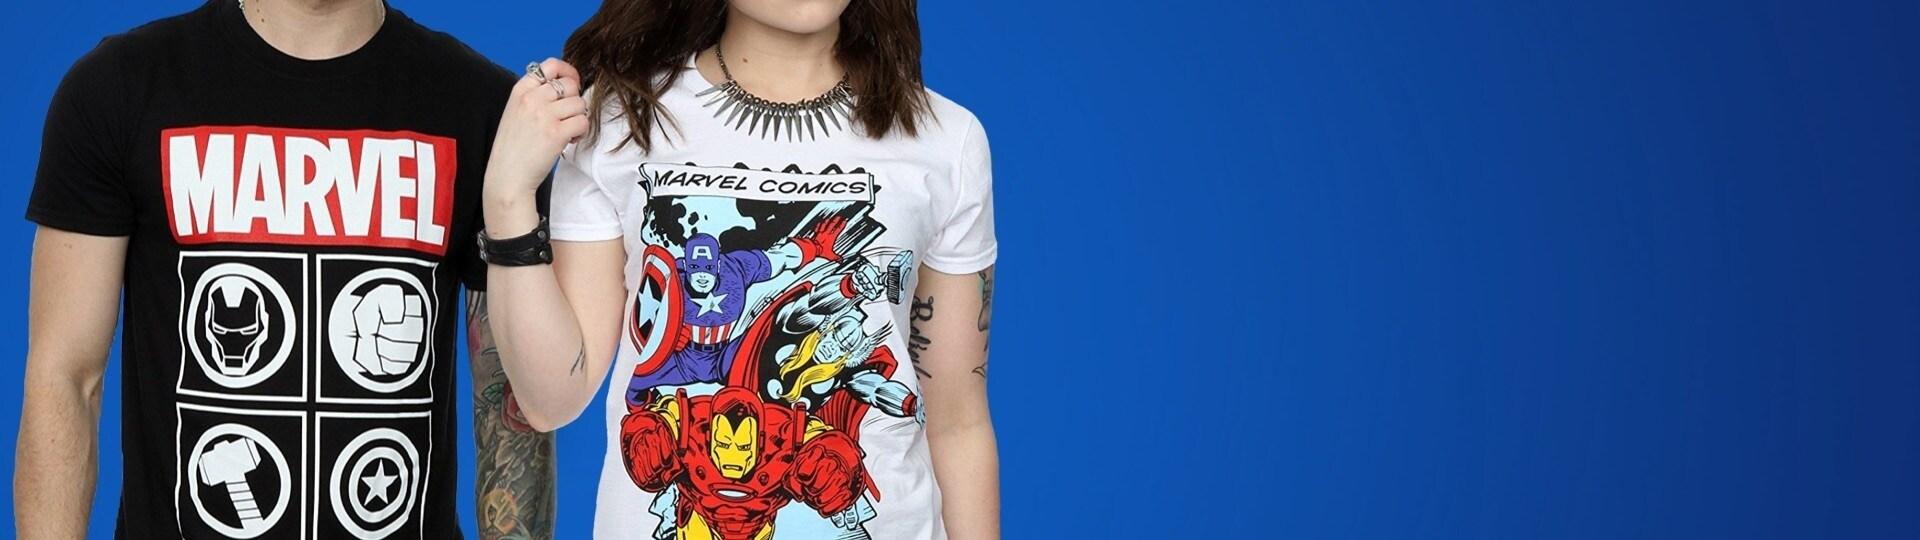 Amazon | Avengers Marvel Shop